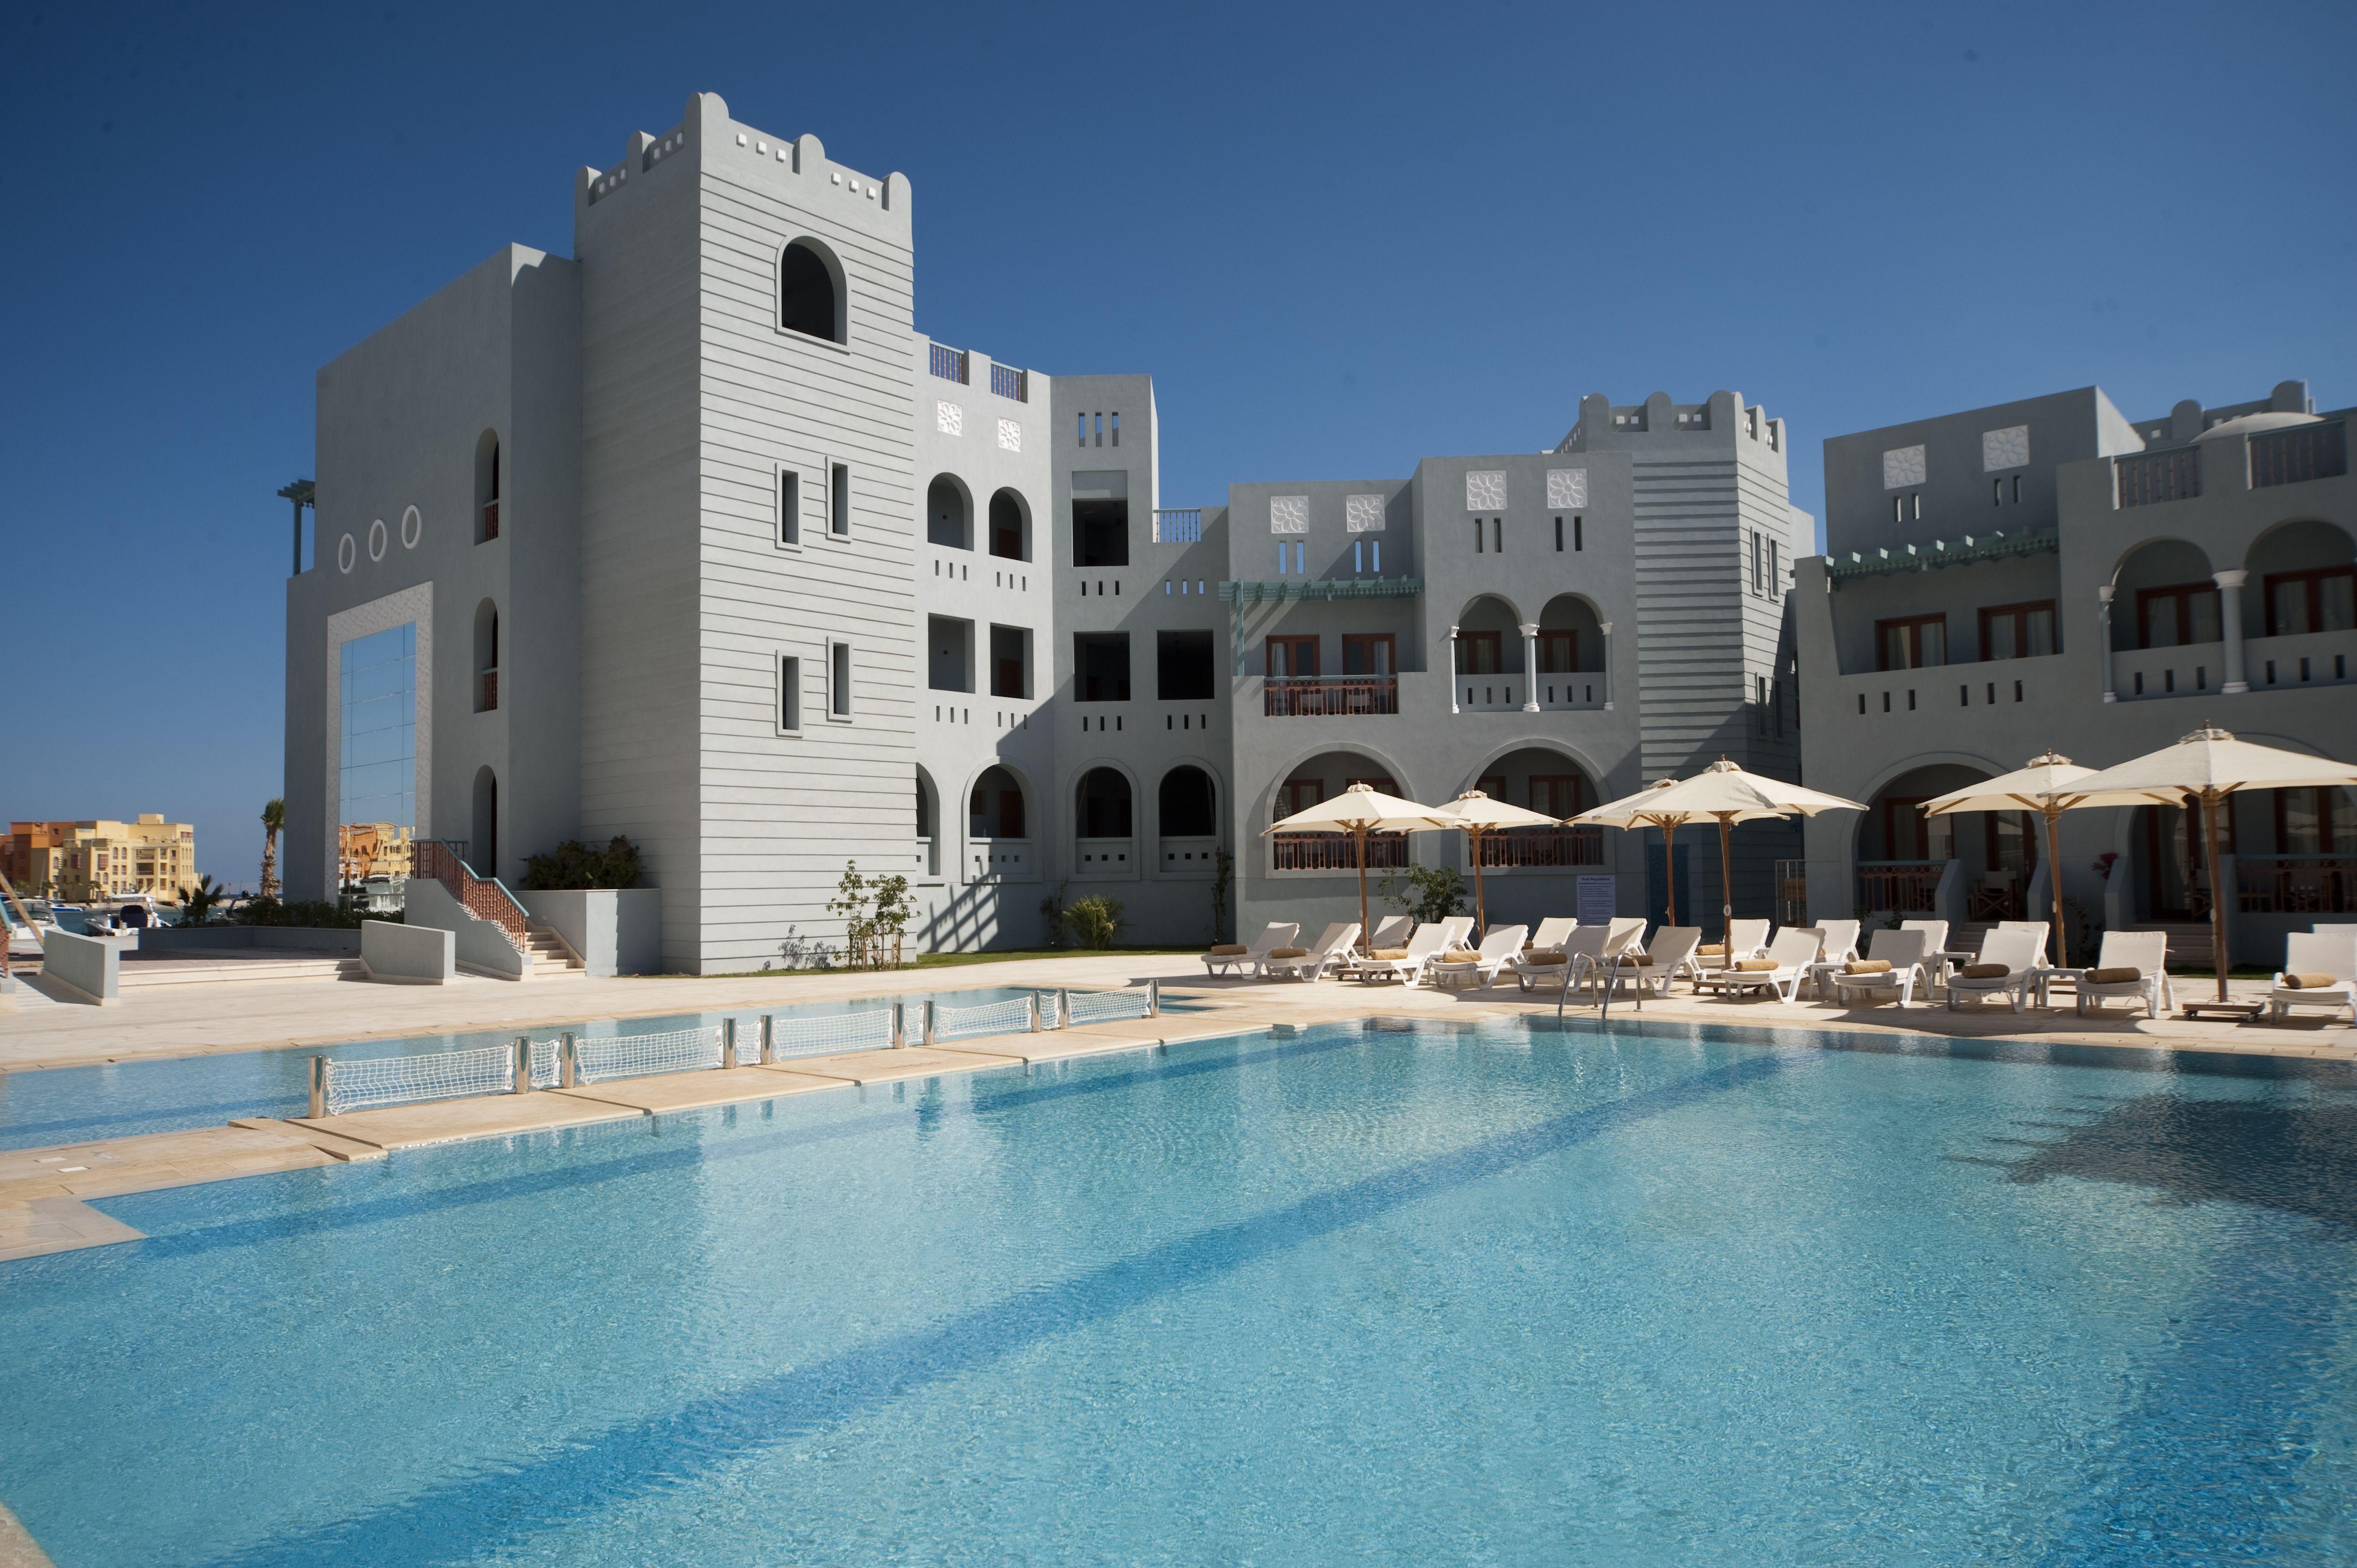 Great Hotel At The New Abu Tig Marina Fanadir Hotel A 4 Star In The Red Sea Vantage Travel Great Hotel International Travel